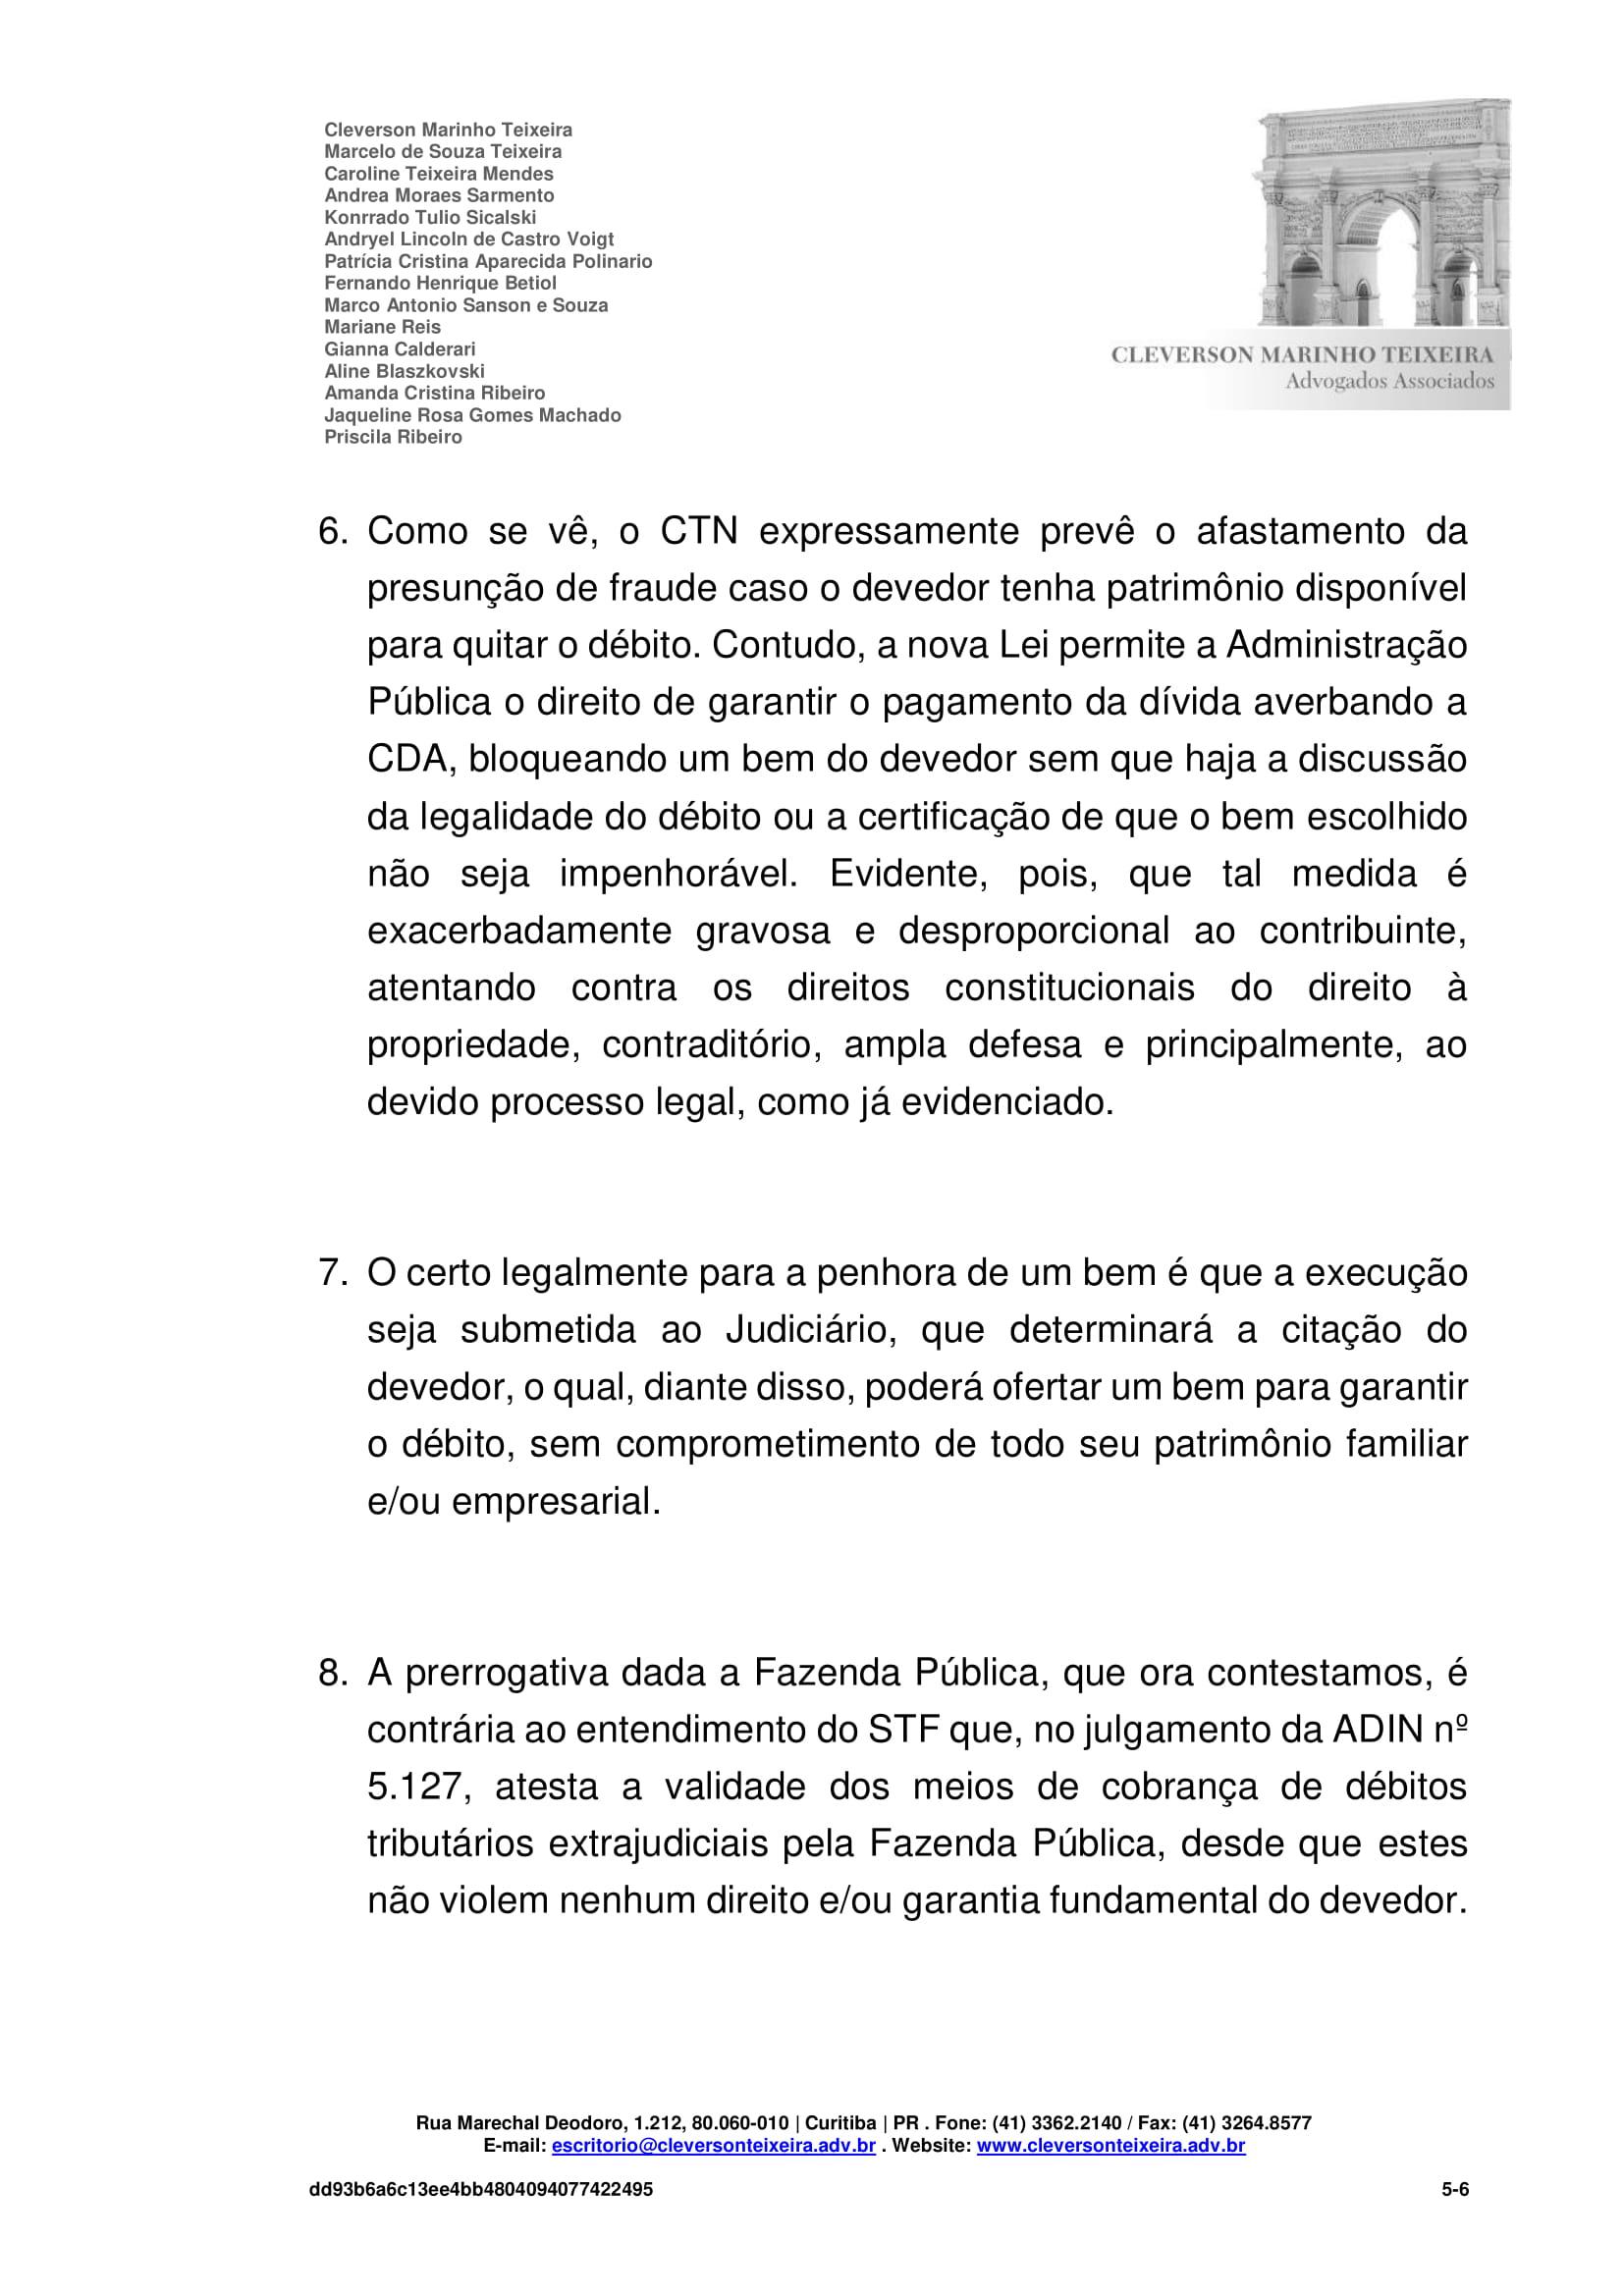 MANIFESTAÇÃO - IDL 2 (25 01 2016) (1)-5